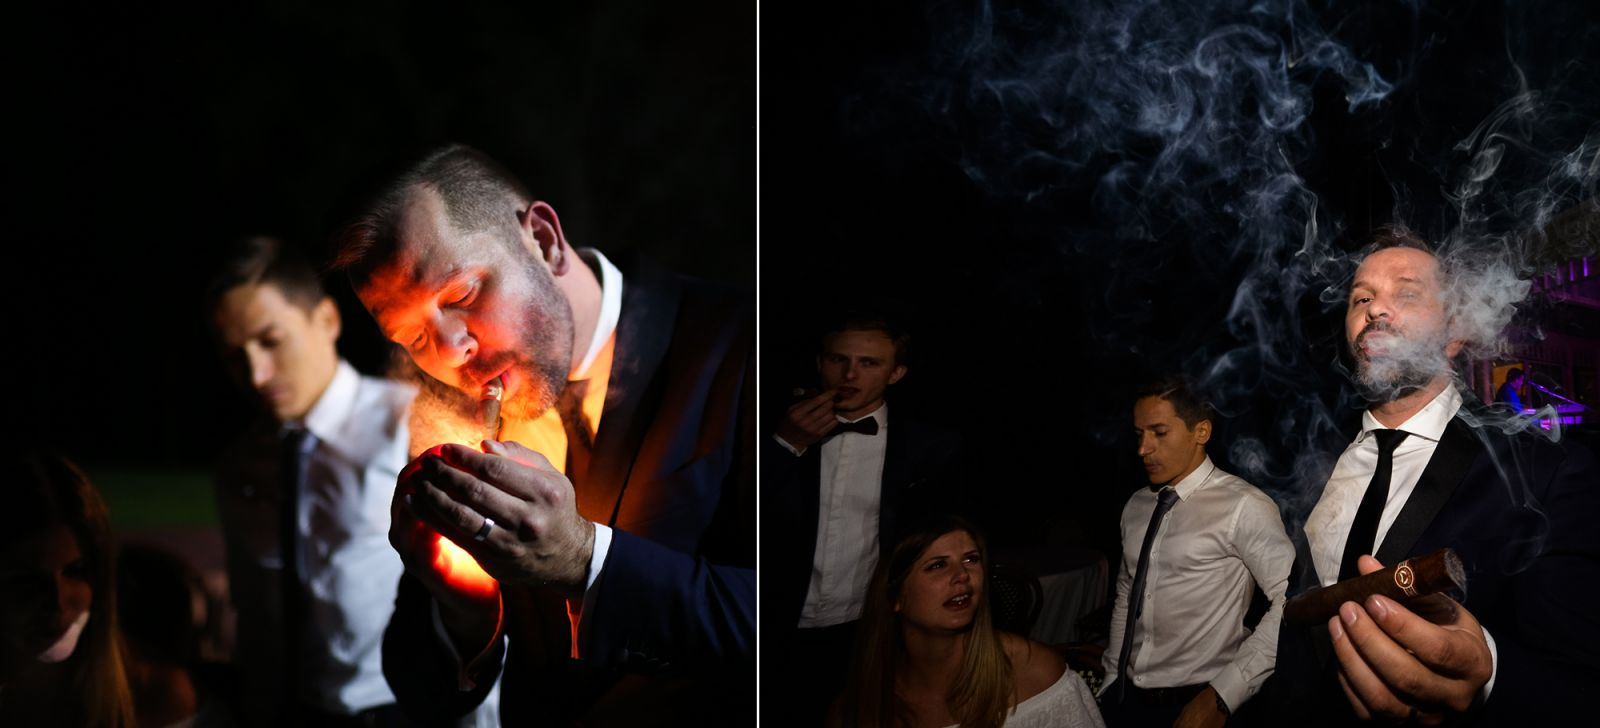 20_groom-smokes-cigar-at-wedding-reception-captured-by-hunter-valley-wedding-photographer